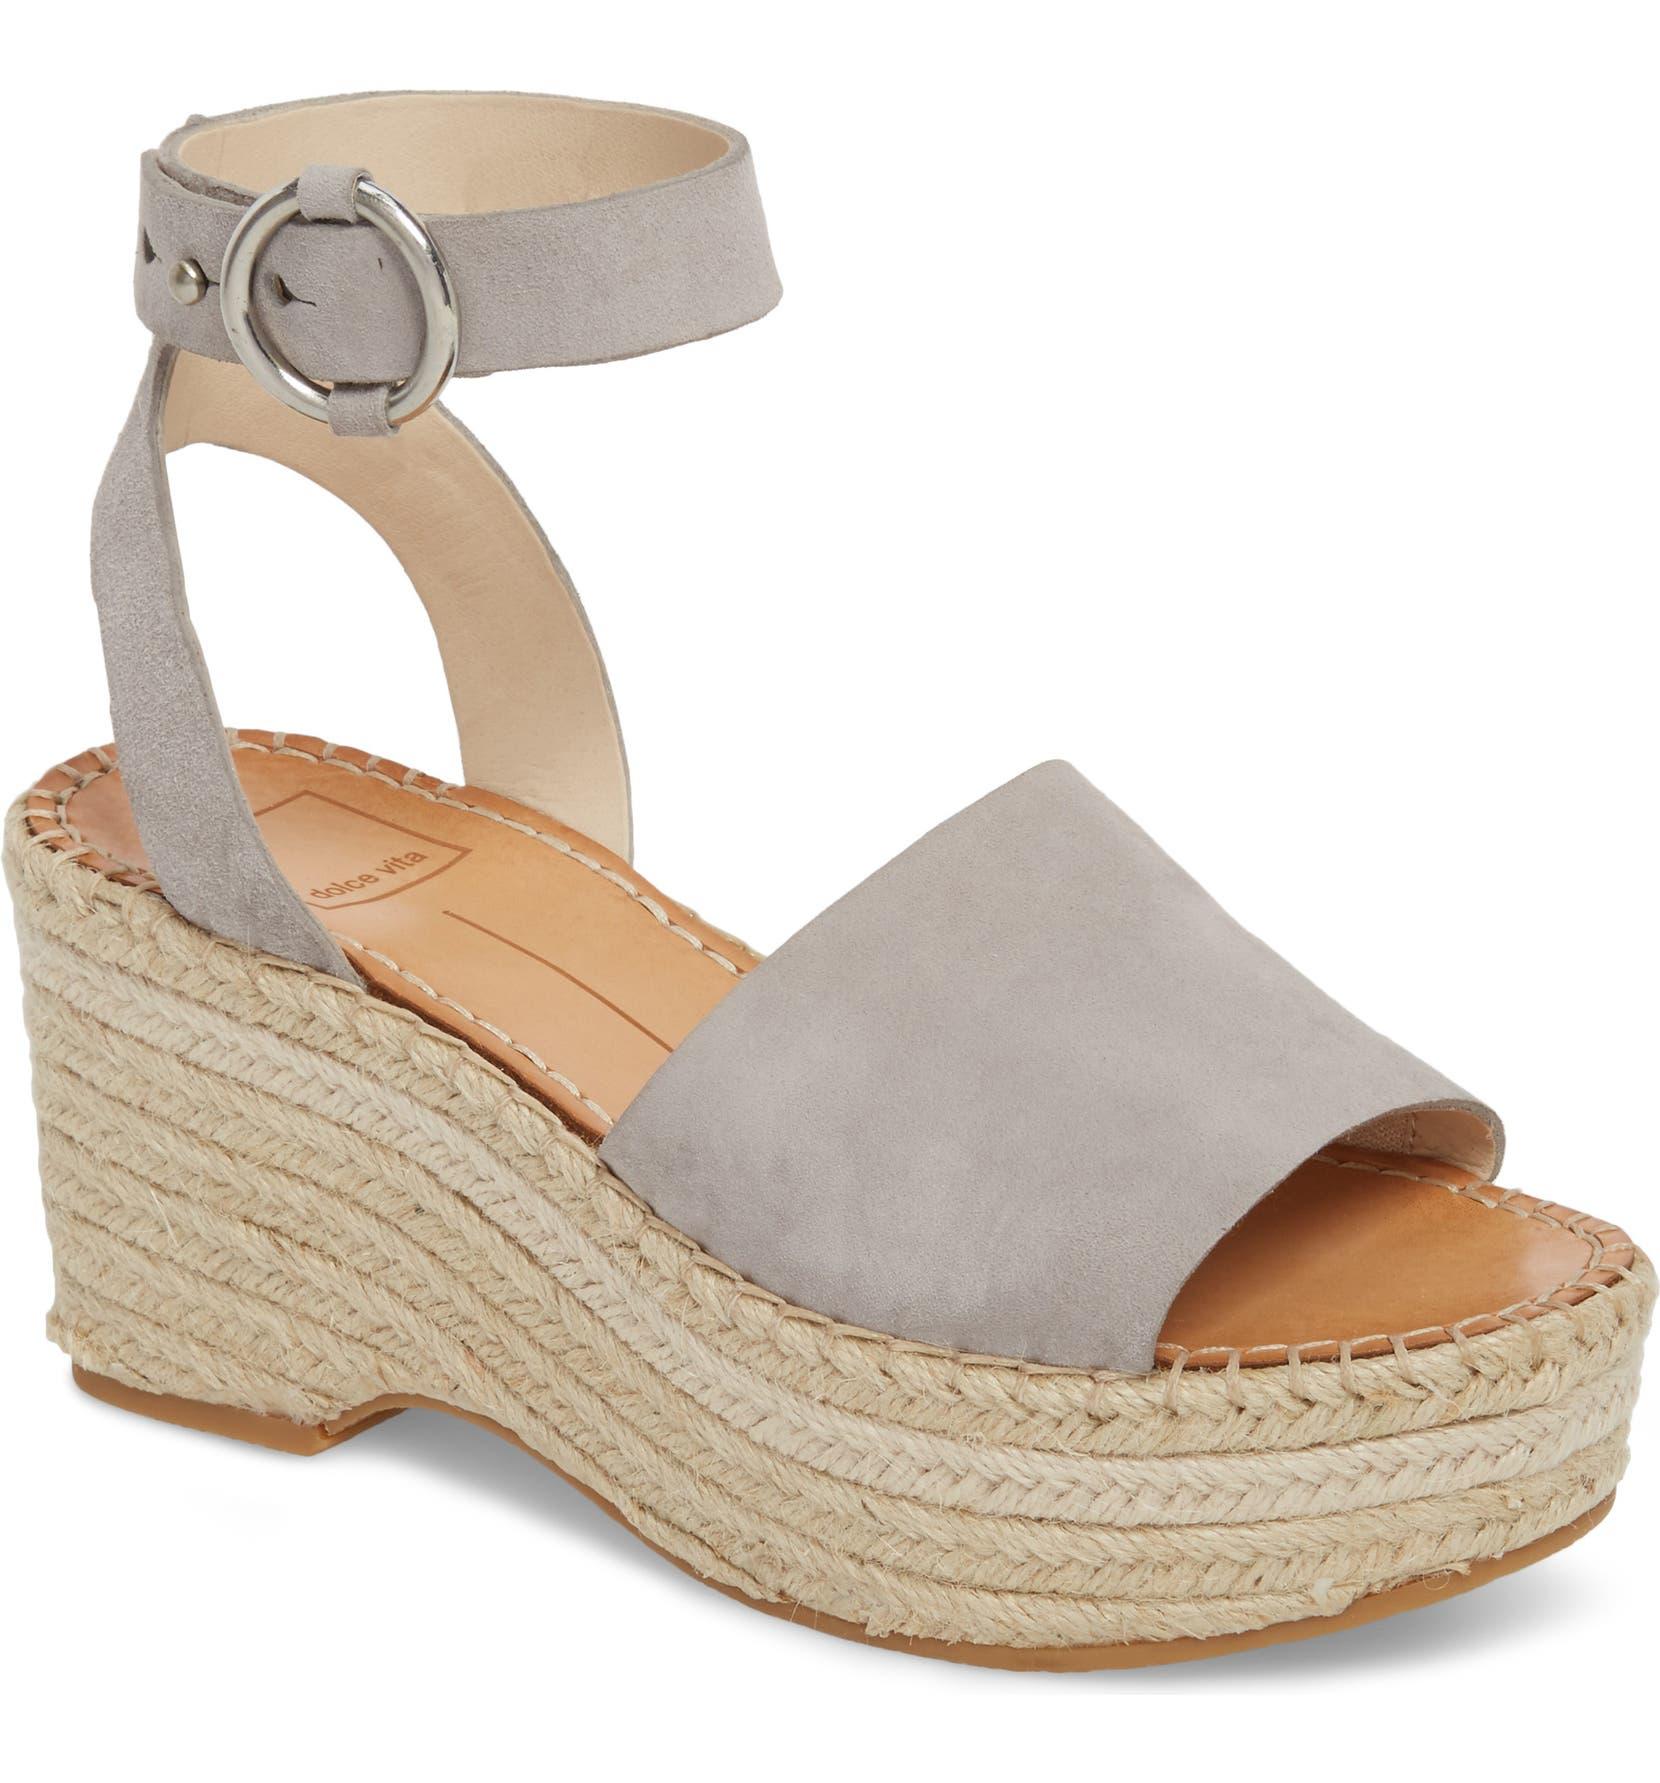 16f3544a6b83 Dolce Vita Lesly Espadrille Platform Sandal (Women)